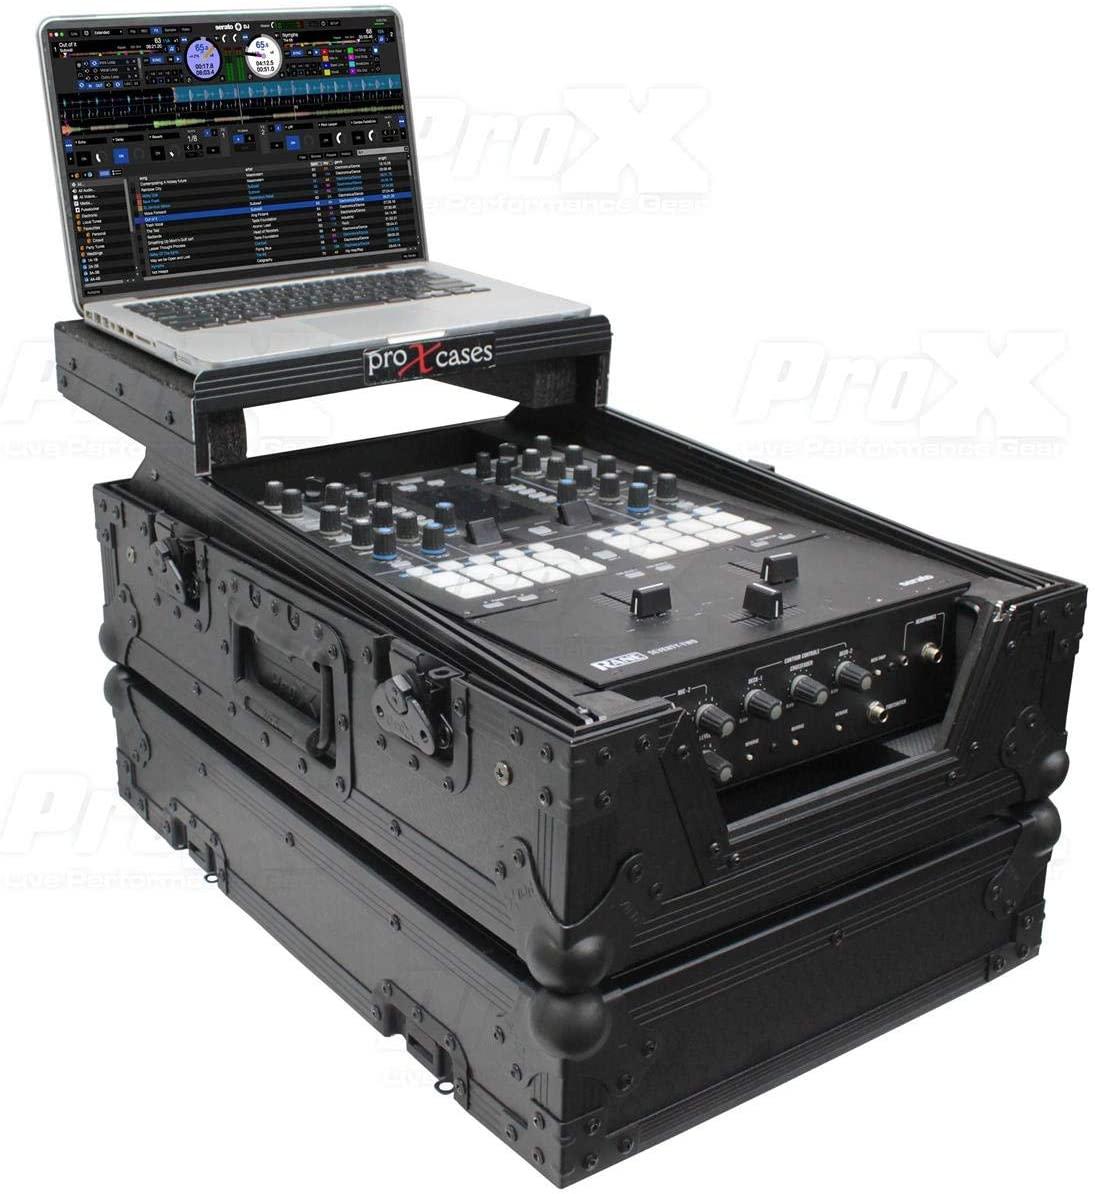 Prox XS-RANE72LTBL 11 ATA-300 Style Gig Ready Flight/Road Case with Laptop Shelf for Rane Seventy-Two 72 DJ Mixer, Black on Black